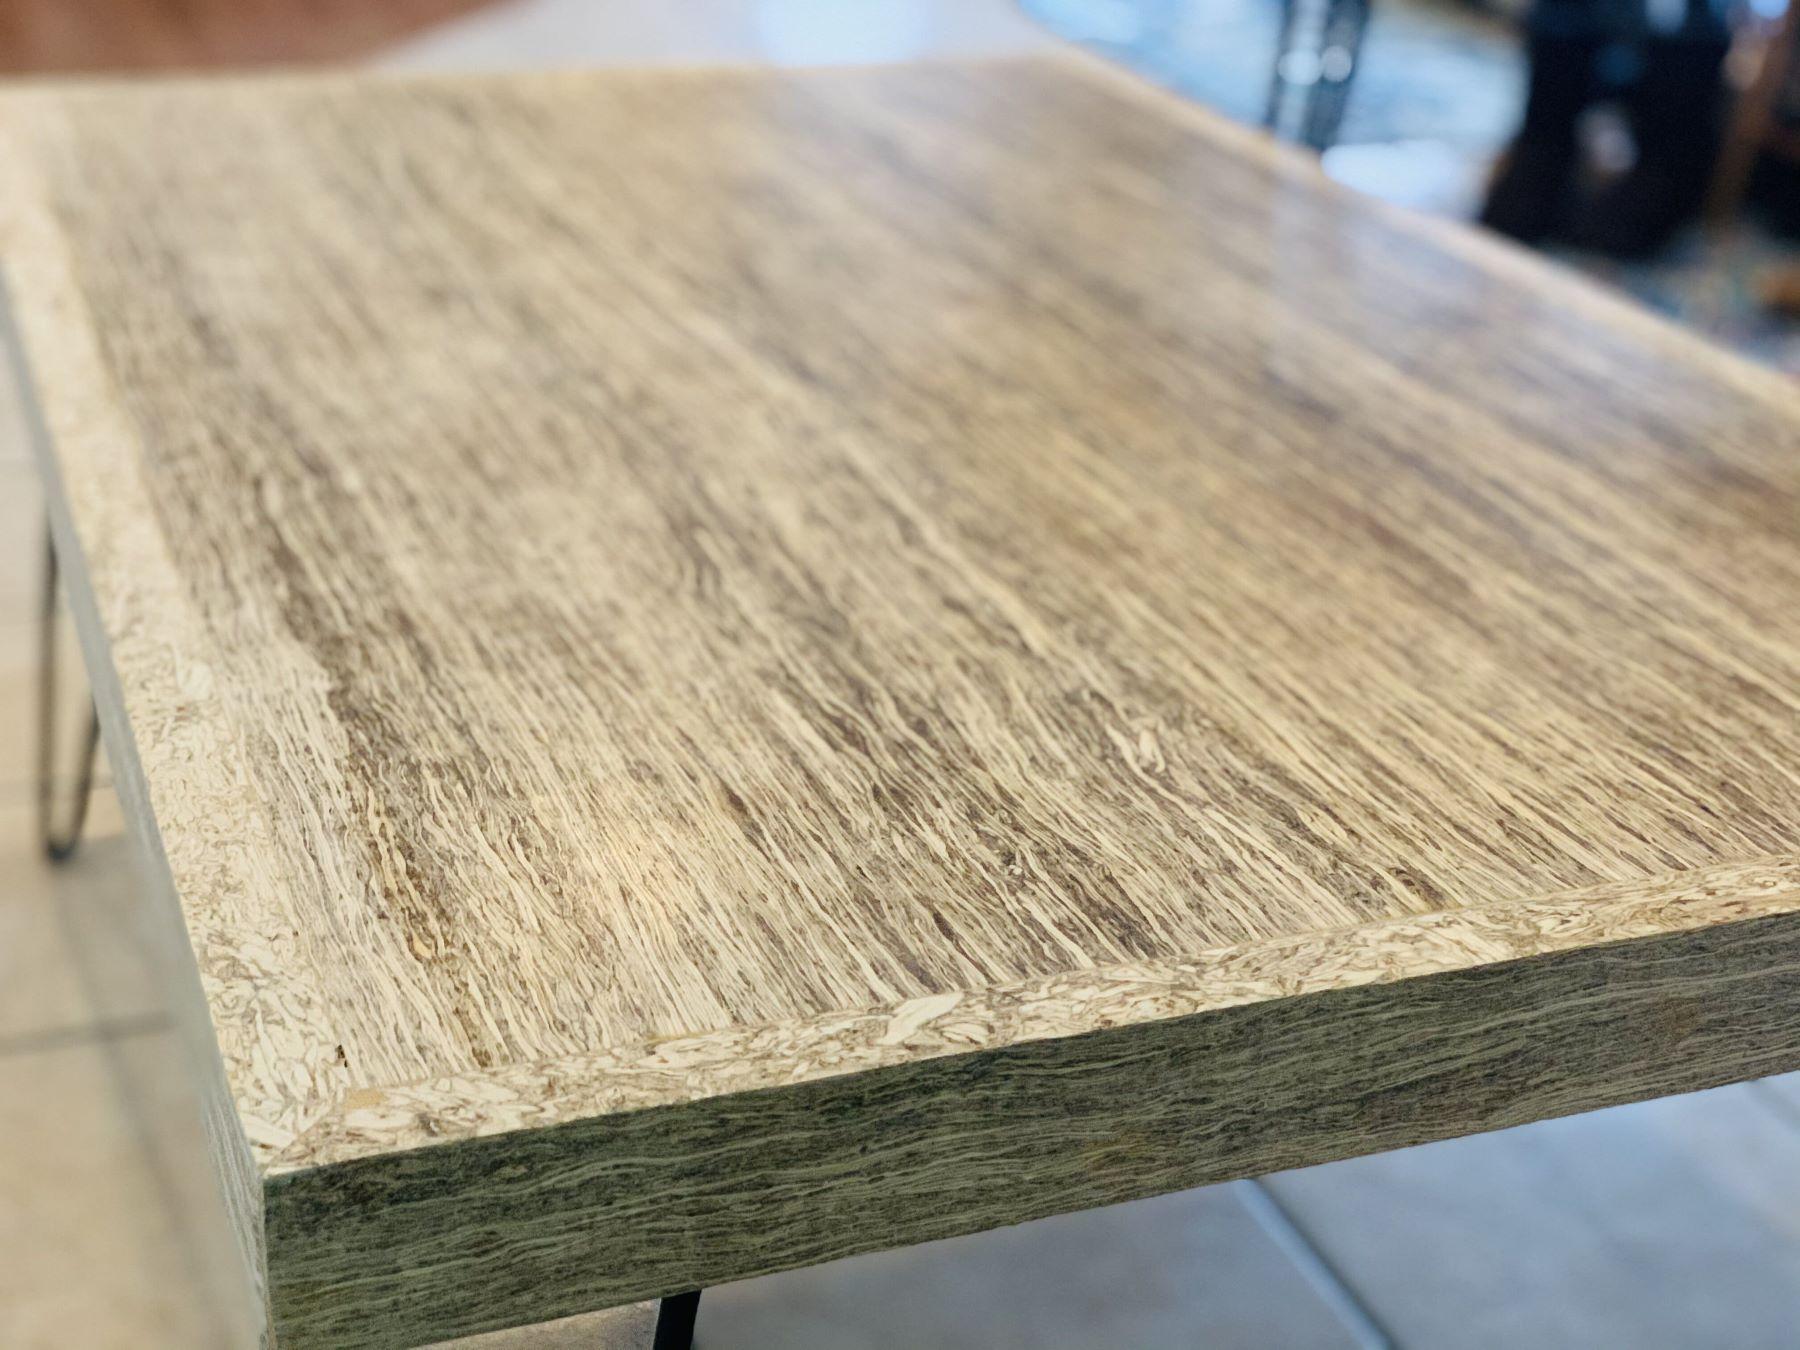 finished hempwood table